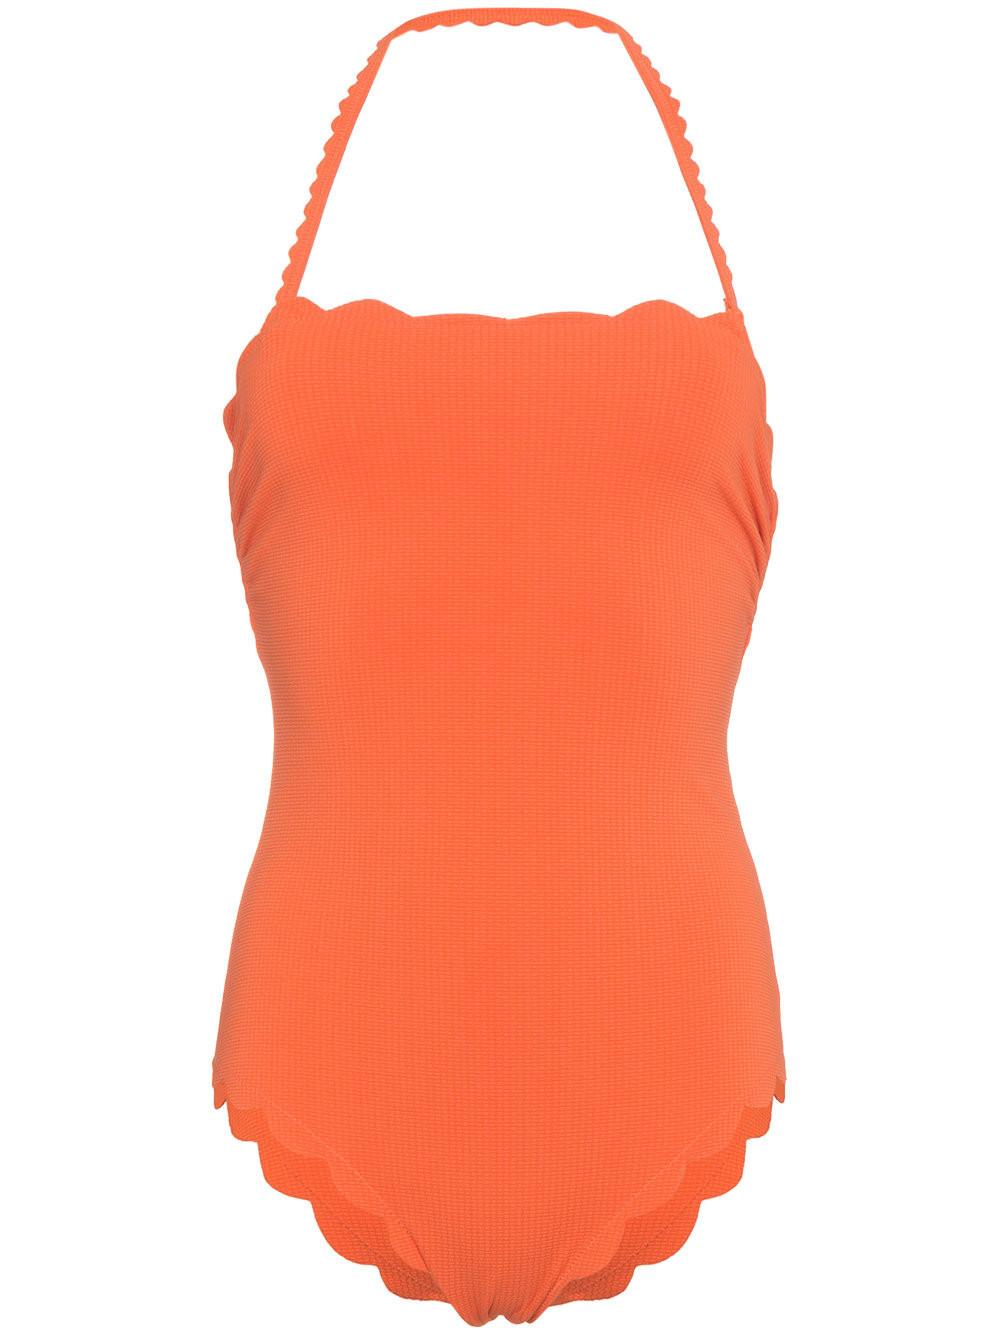 Super Micro Bikini New 2014 Products Swimwears Pink Brazil